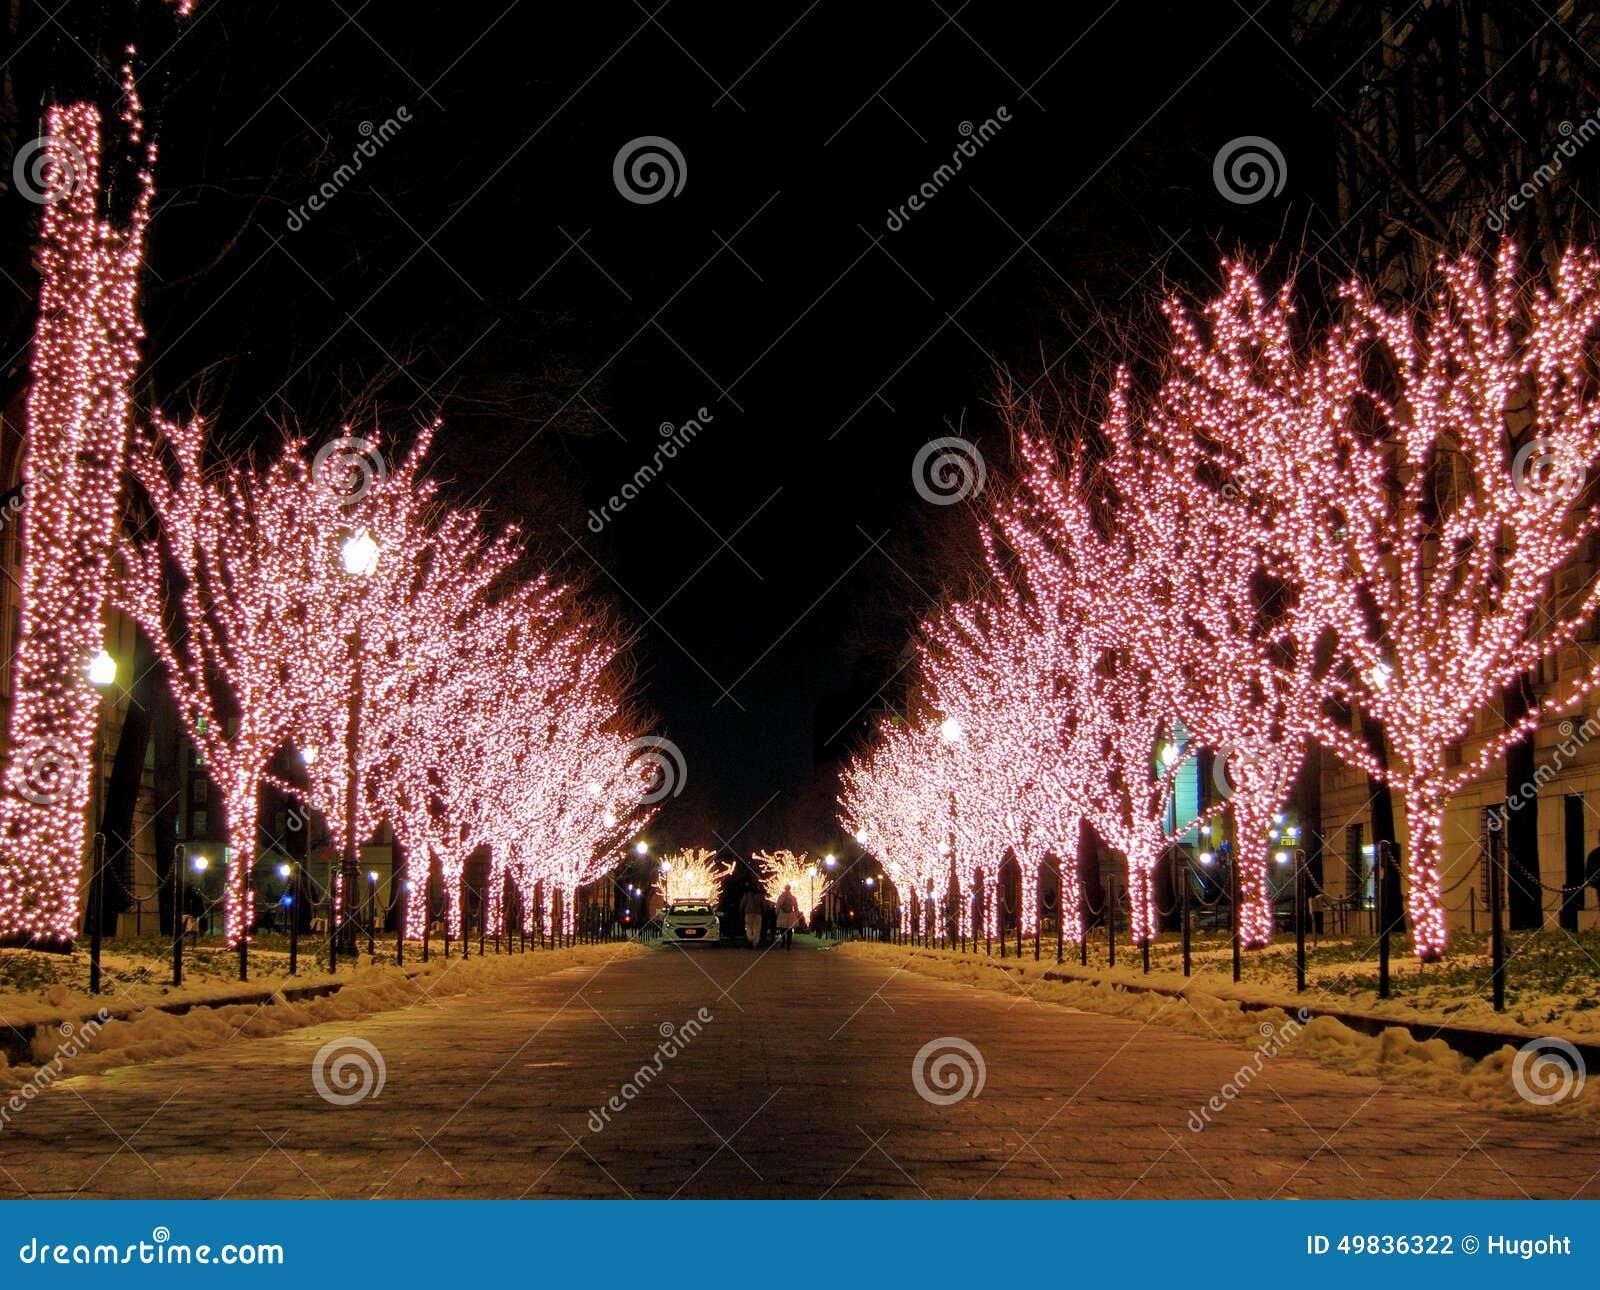 Lit Up Christmas Trees Stock Photo - Image: 49836322